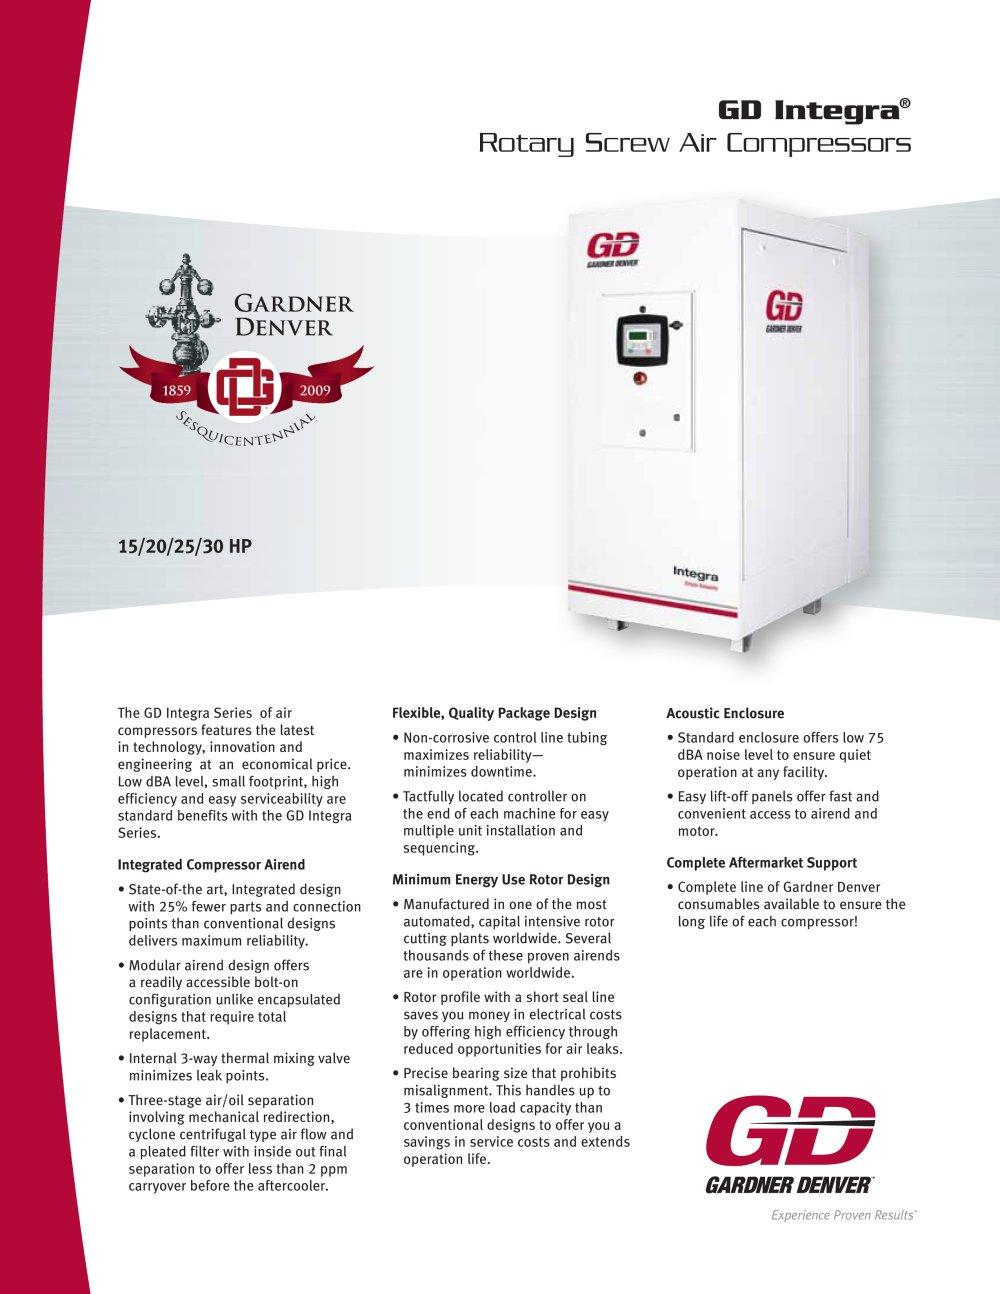 integra 15-30hp brochure - 1 / 2 pages integra 15-30hp brochure - gardner  denver rds series refrigerated dryer manual